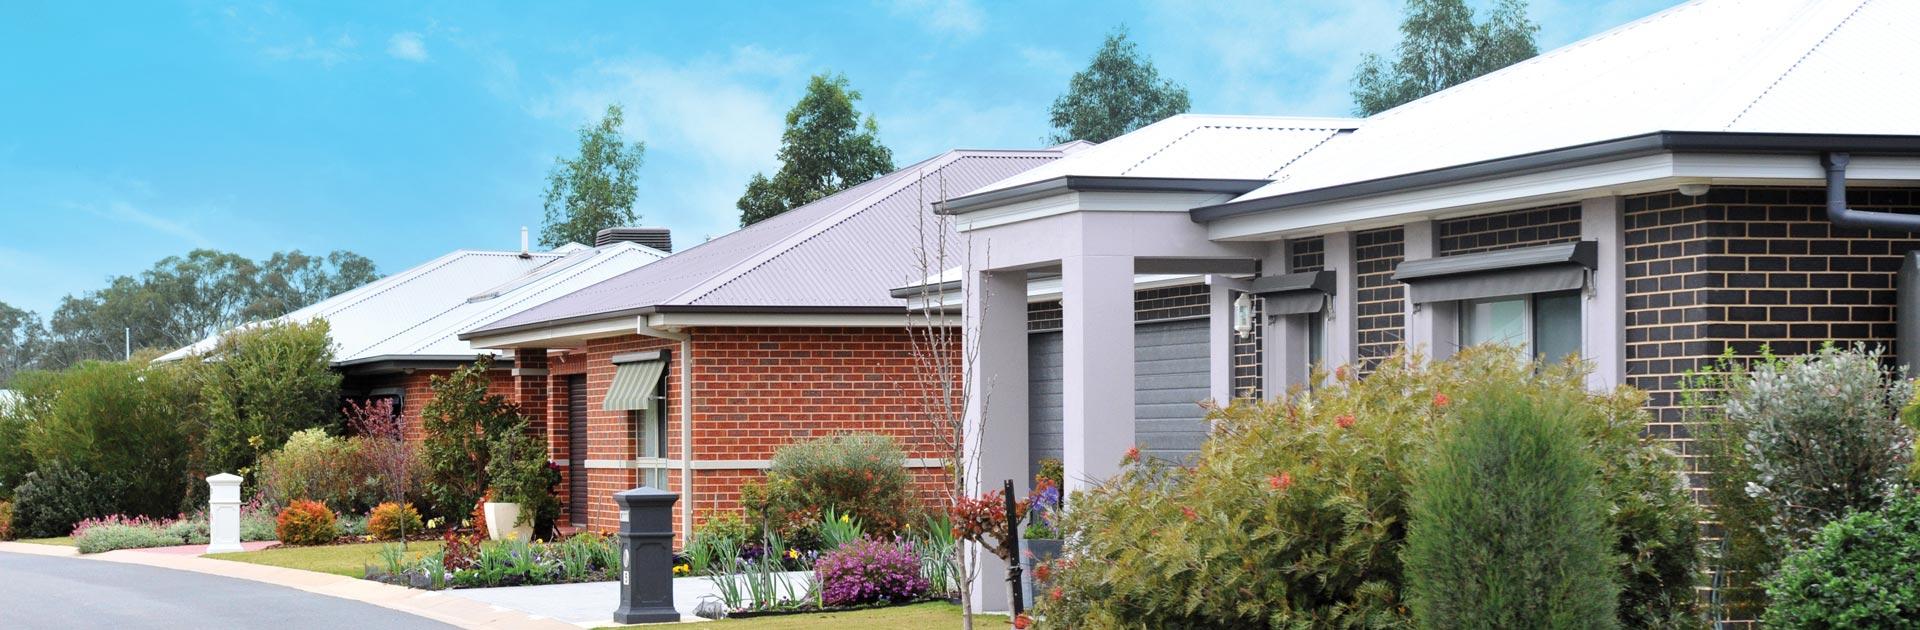 Westmont Villas